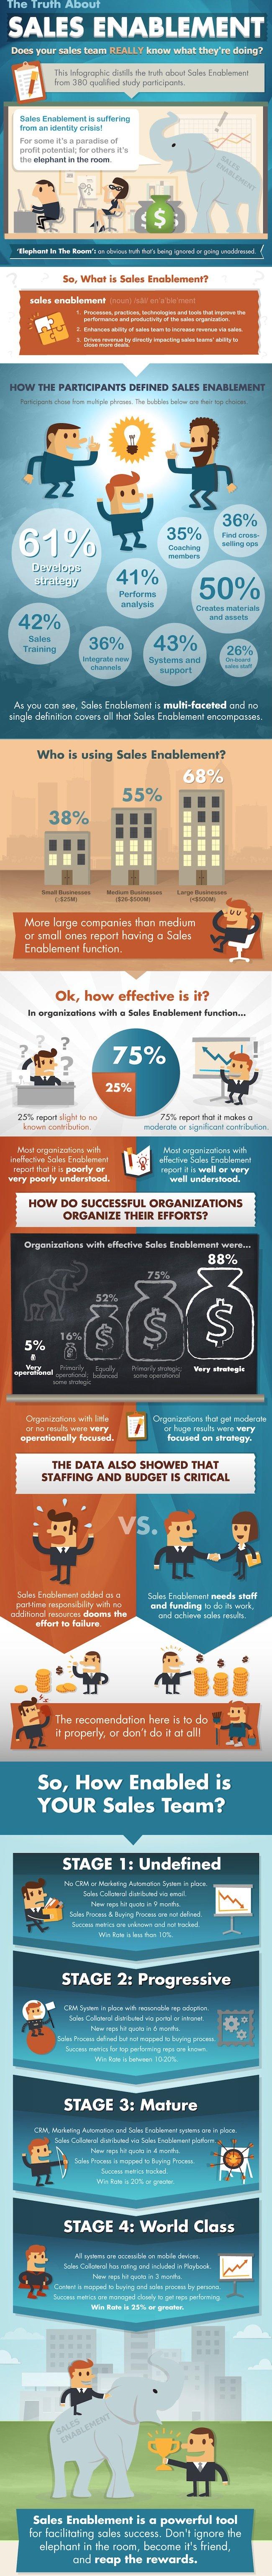 Sales-Enablement-Infografica-1.jpg